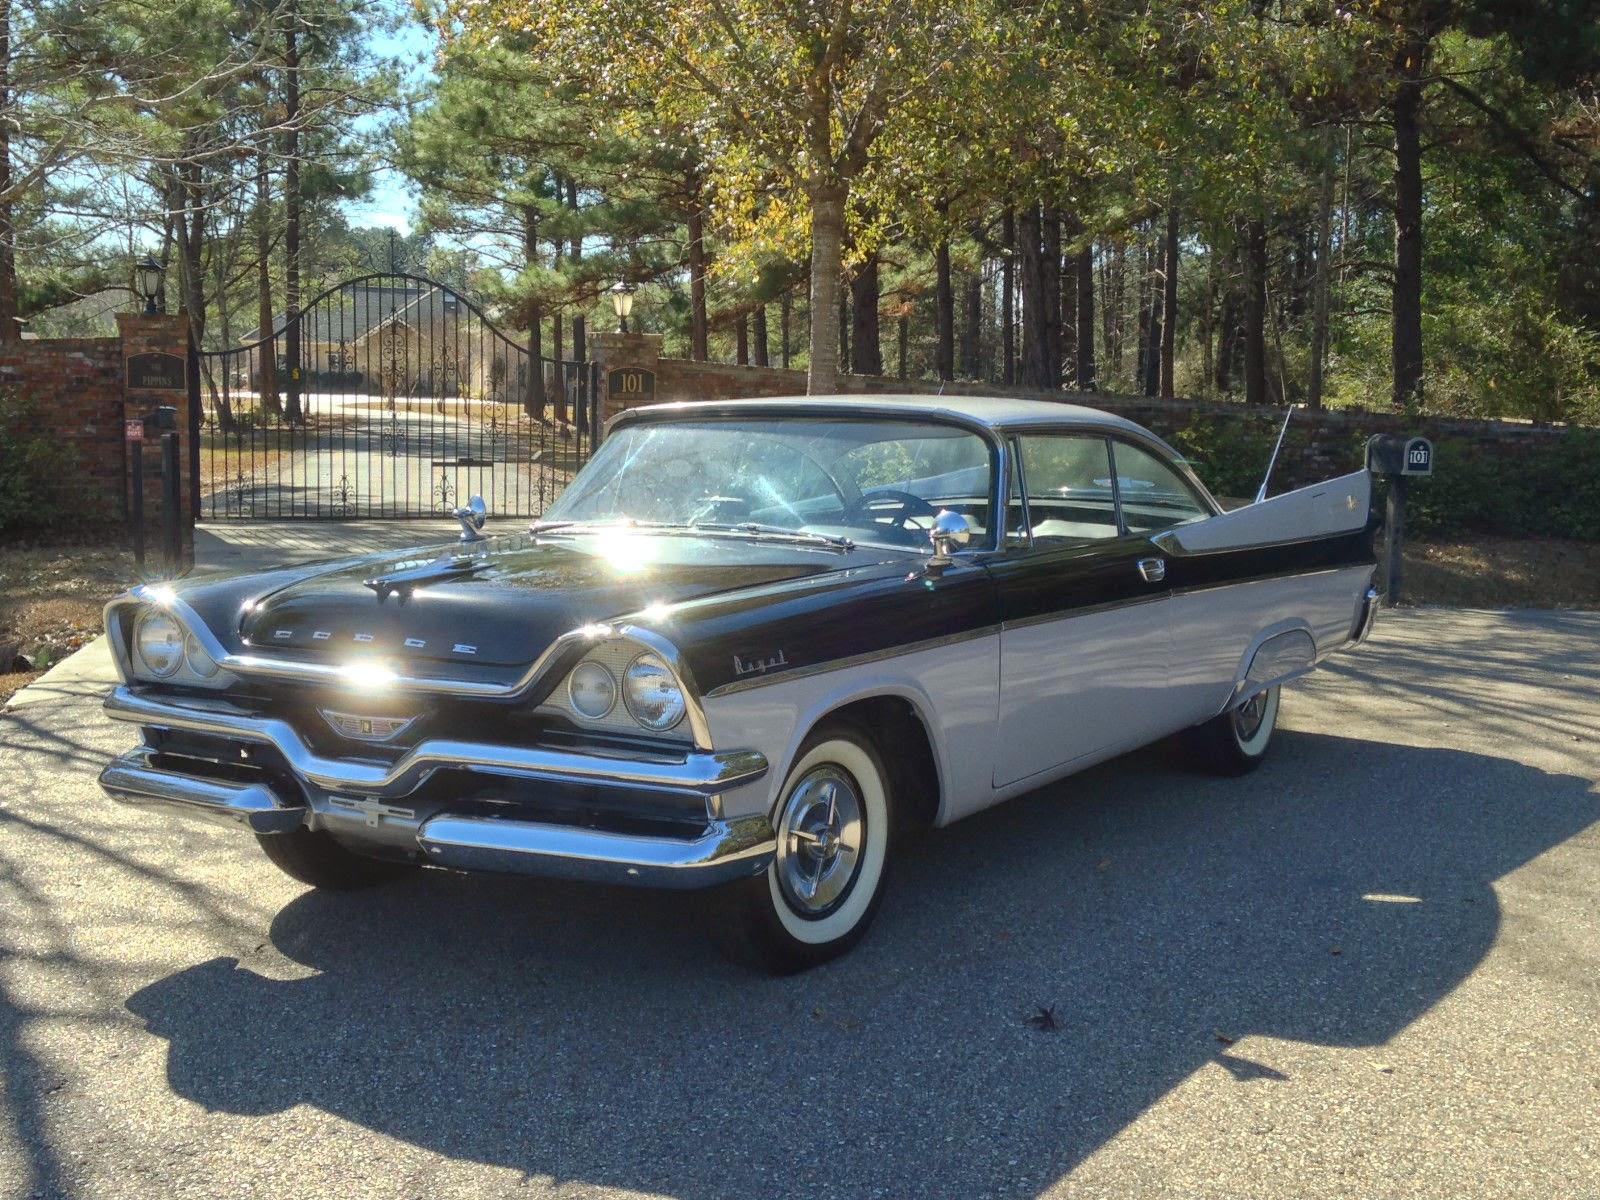 All American Classic Cars 1957 Dodge Royal Lancer 2 Door Hardtop 1949 Coronet